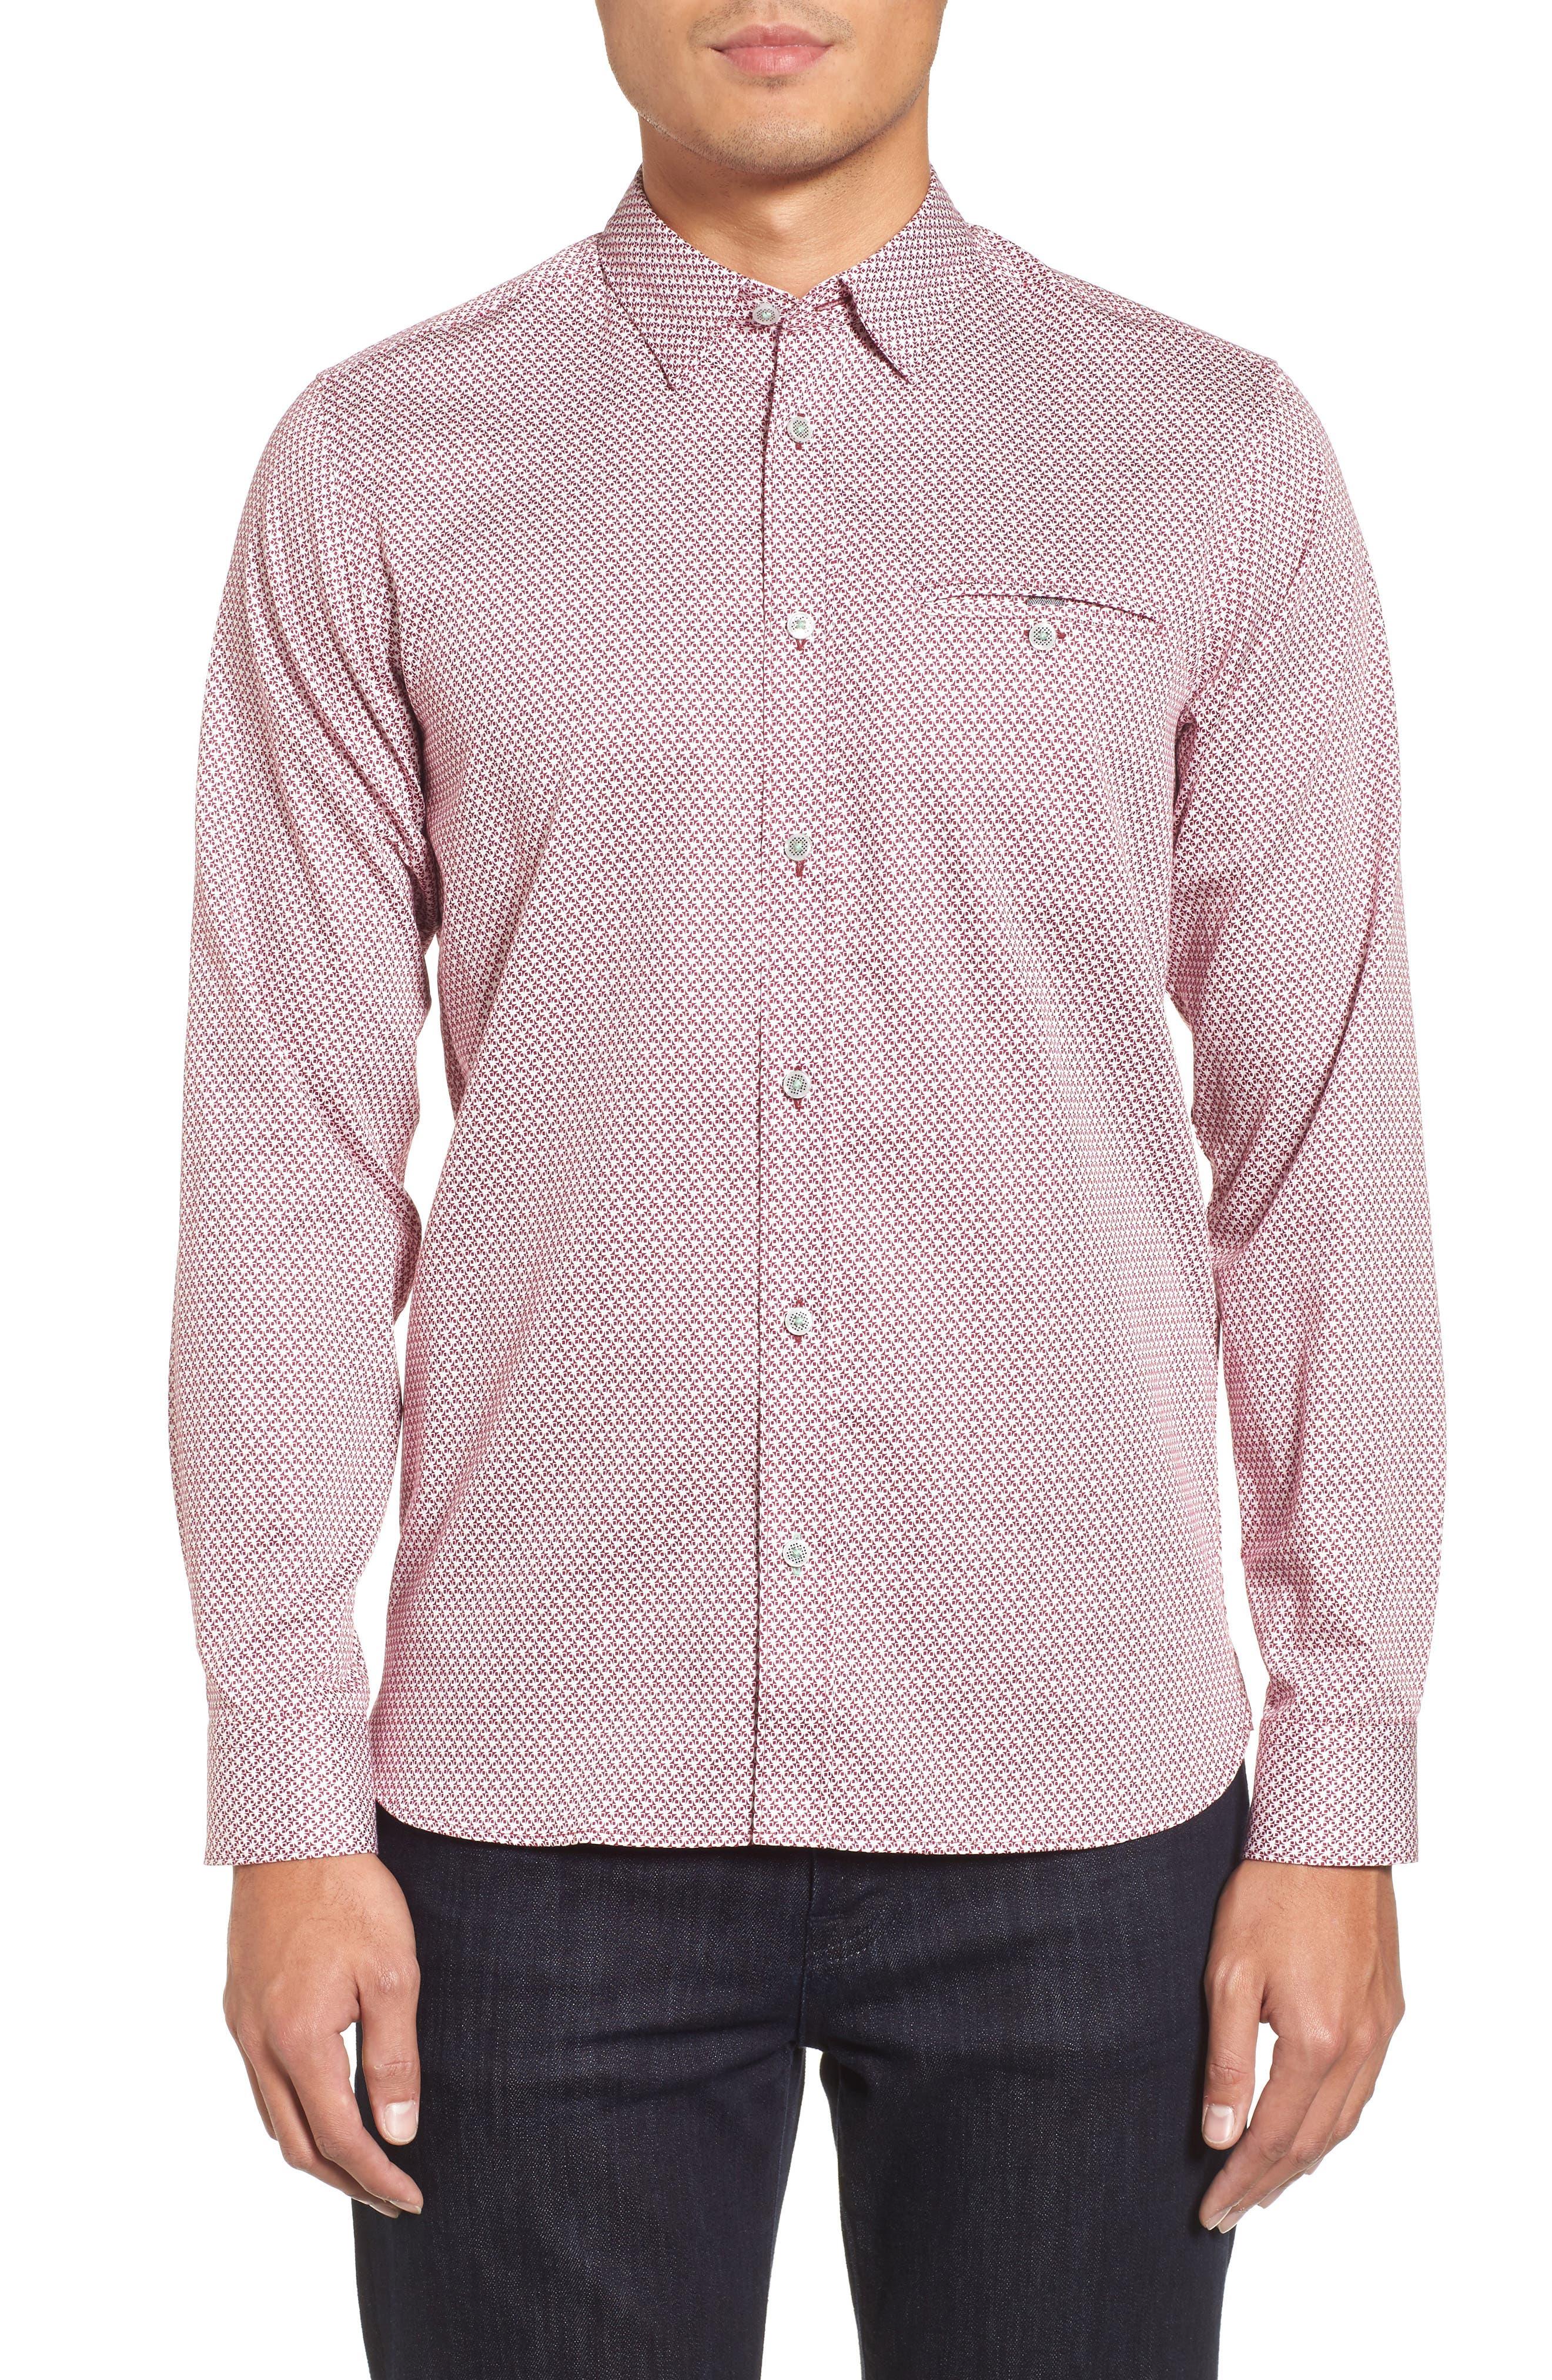 Vilamor Extra Slim Fit Print Sport Shirt,                         Main,                         color, Purple